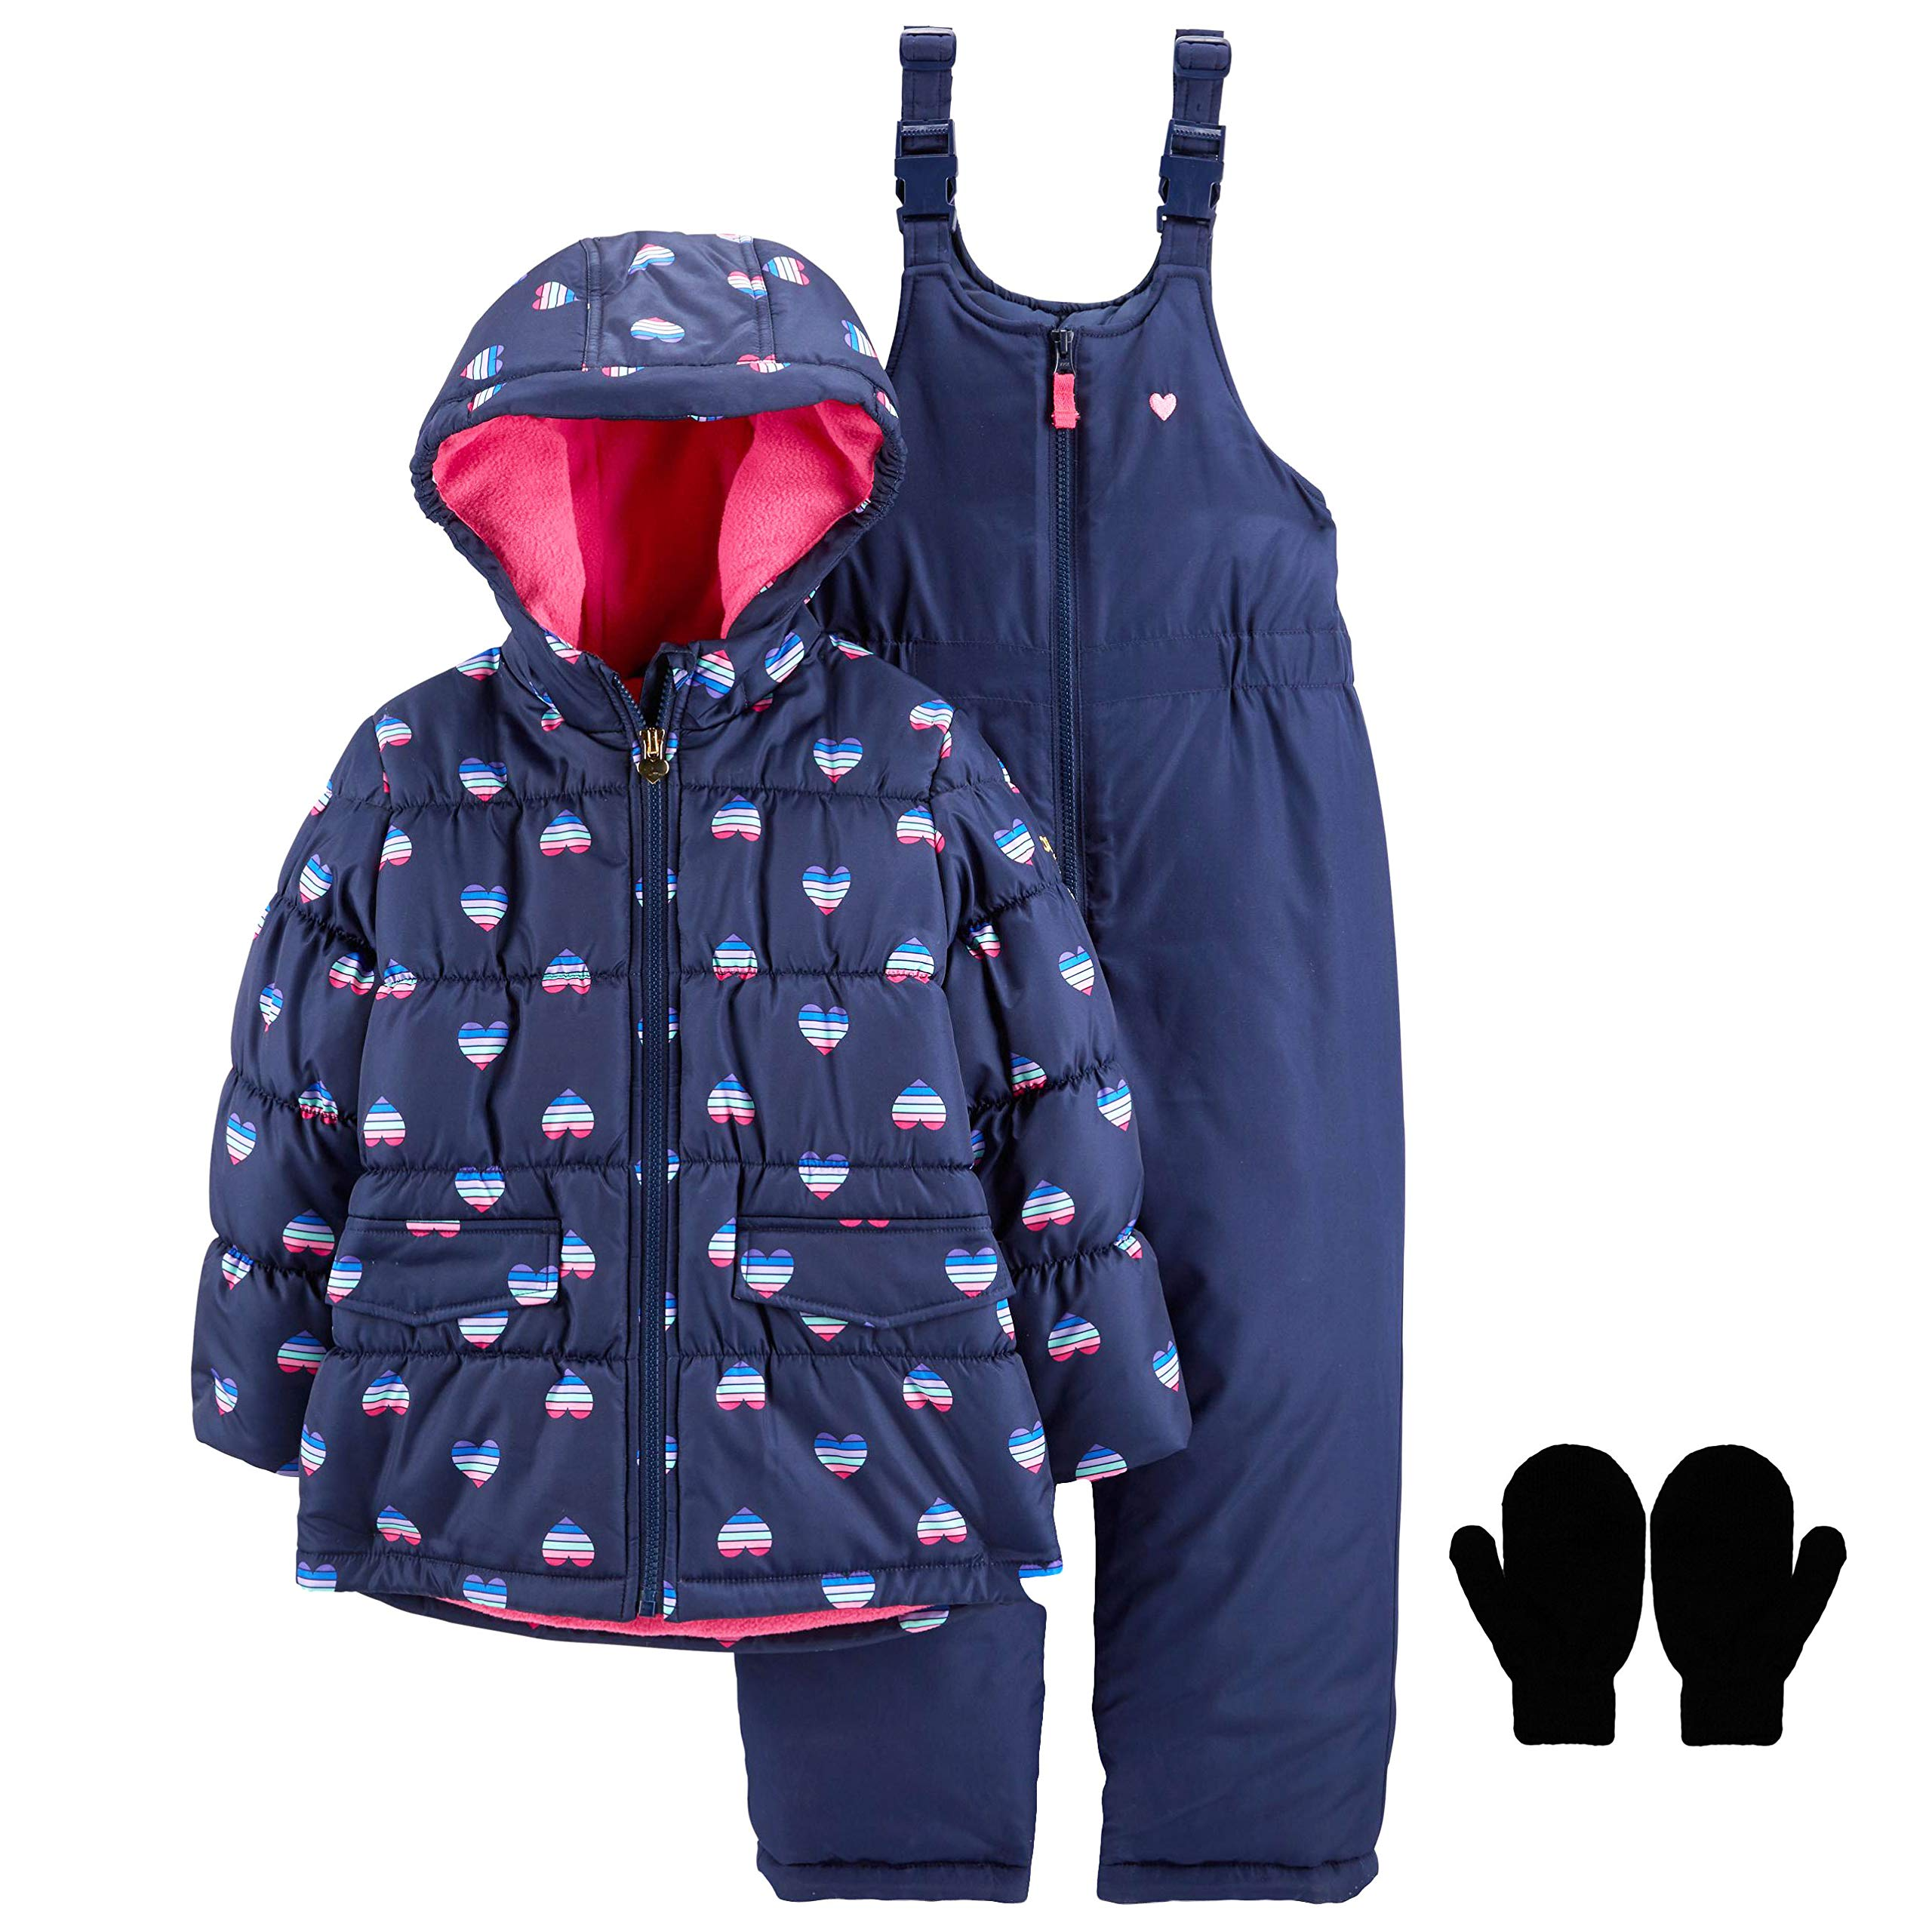 OshKosh Toddler Girls Winter Snowsuit Jacket Snow Pants and Mittens Navy Pink 3T by OshKosh B'Gosh